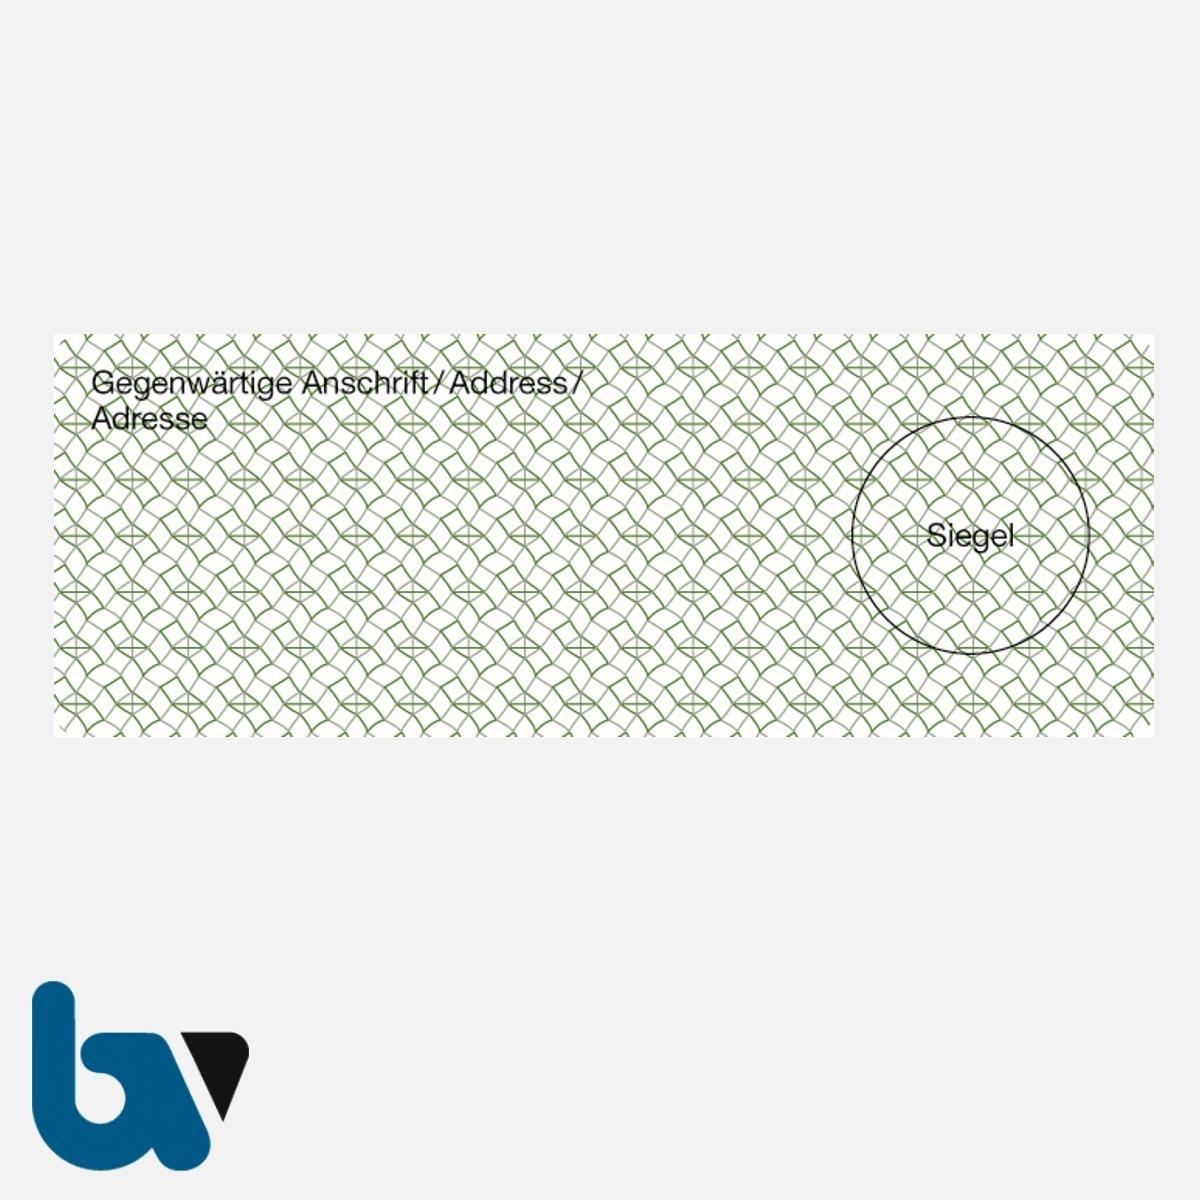 0/519-15 Adressaufkleber Anschriftenänderung | Borgard Verlag GmbH